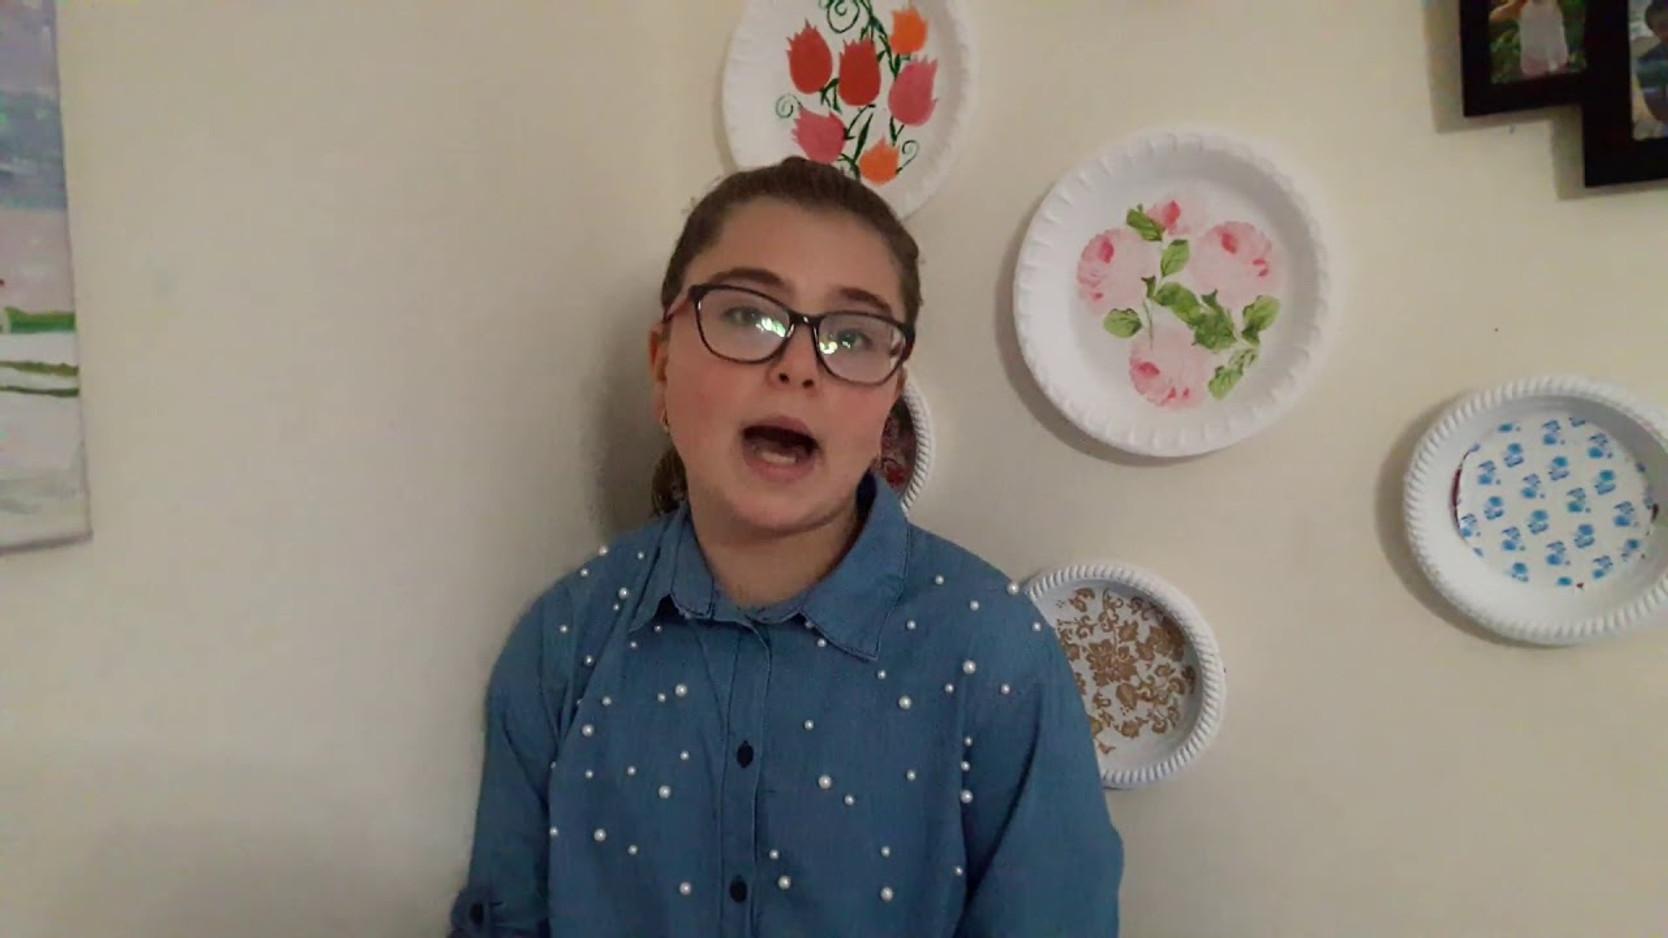 Мариам Хуссейн, 11 лет